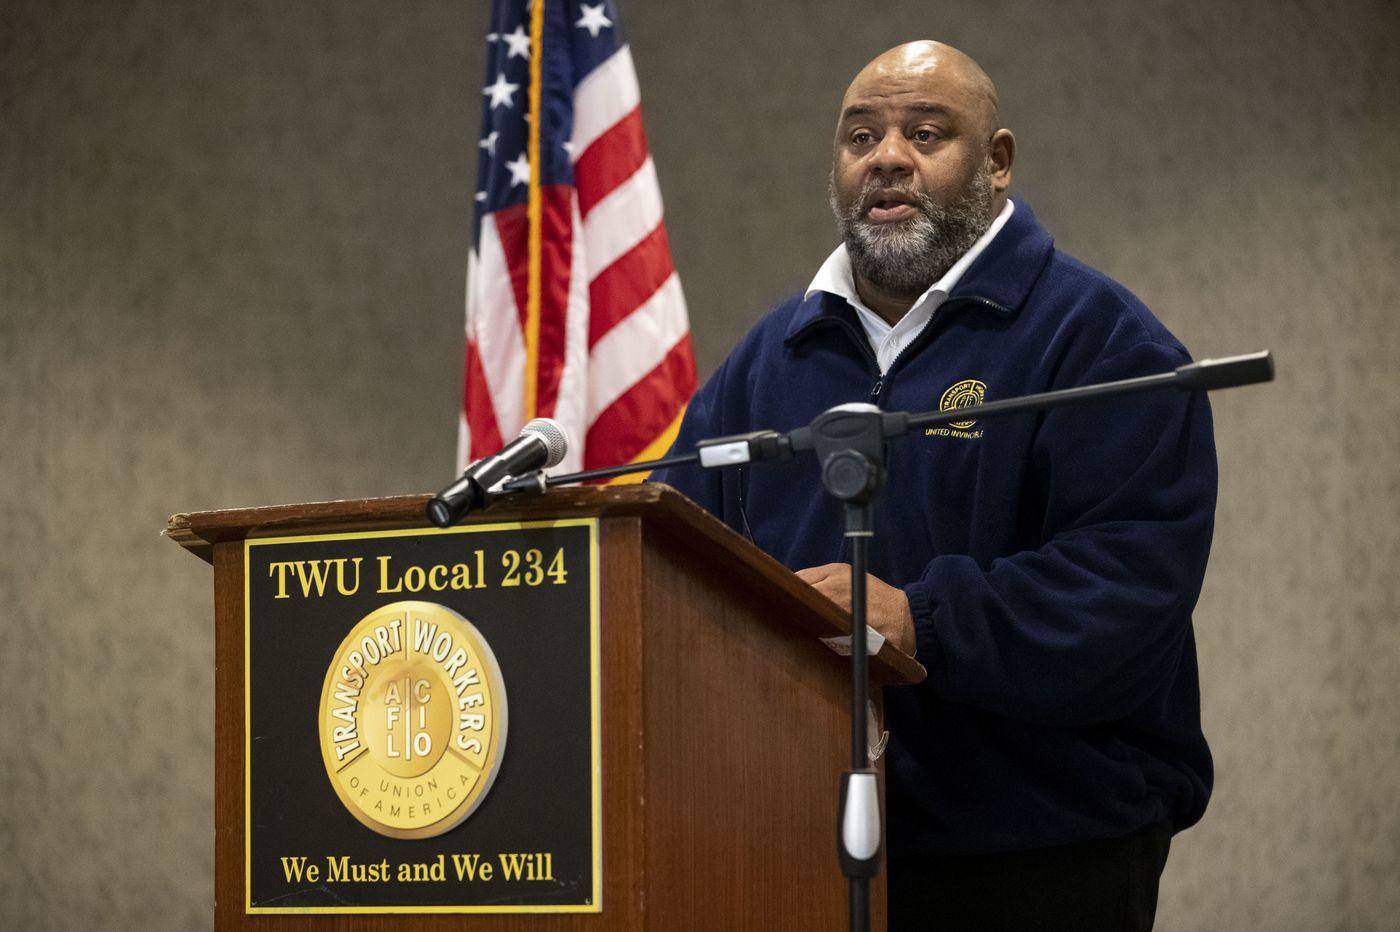 SEPTA has made progress on employees' coronavirus safety demands, union president says